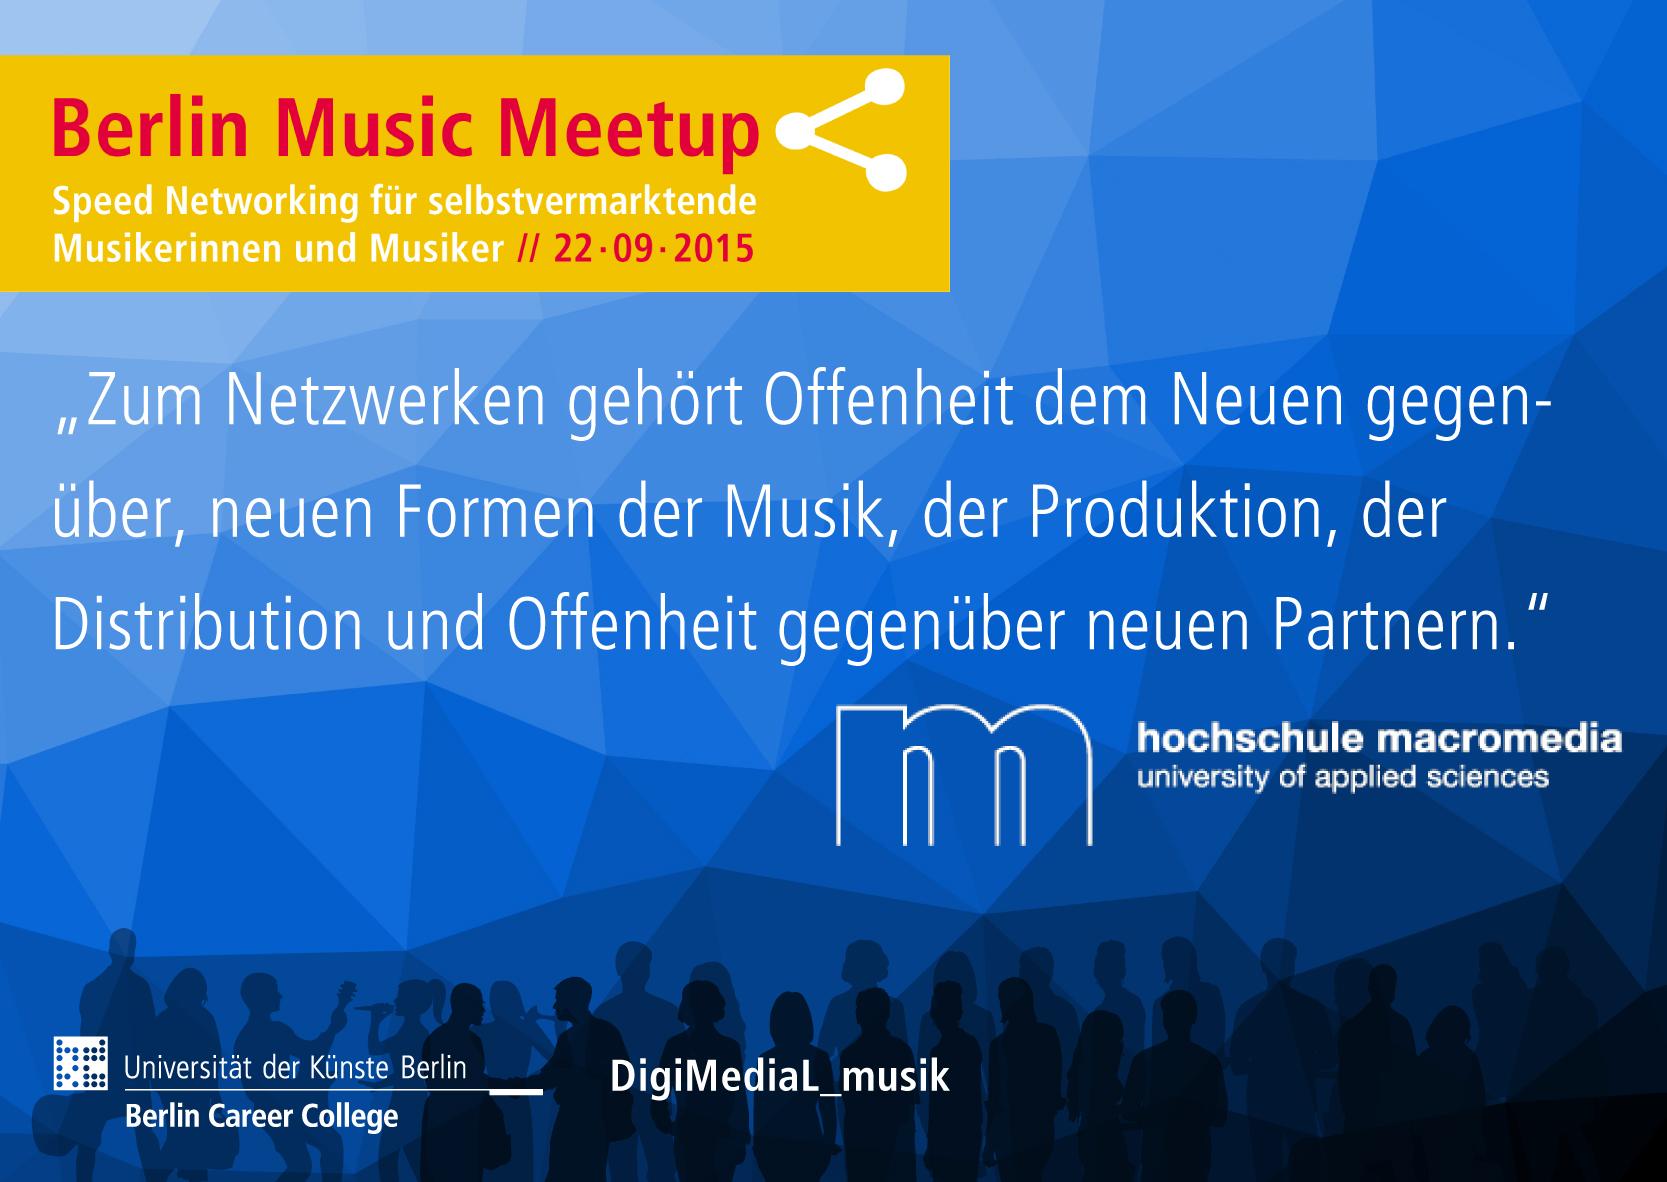 berlin_music_meetup_web_flyer_macromedia